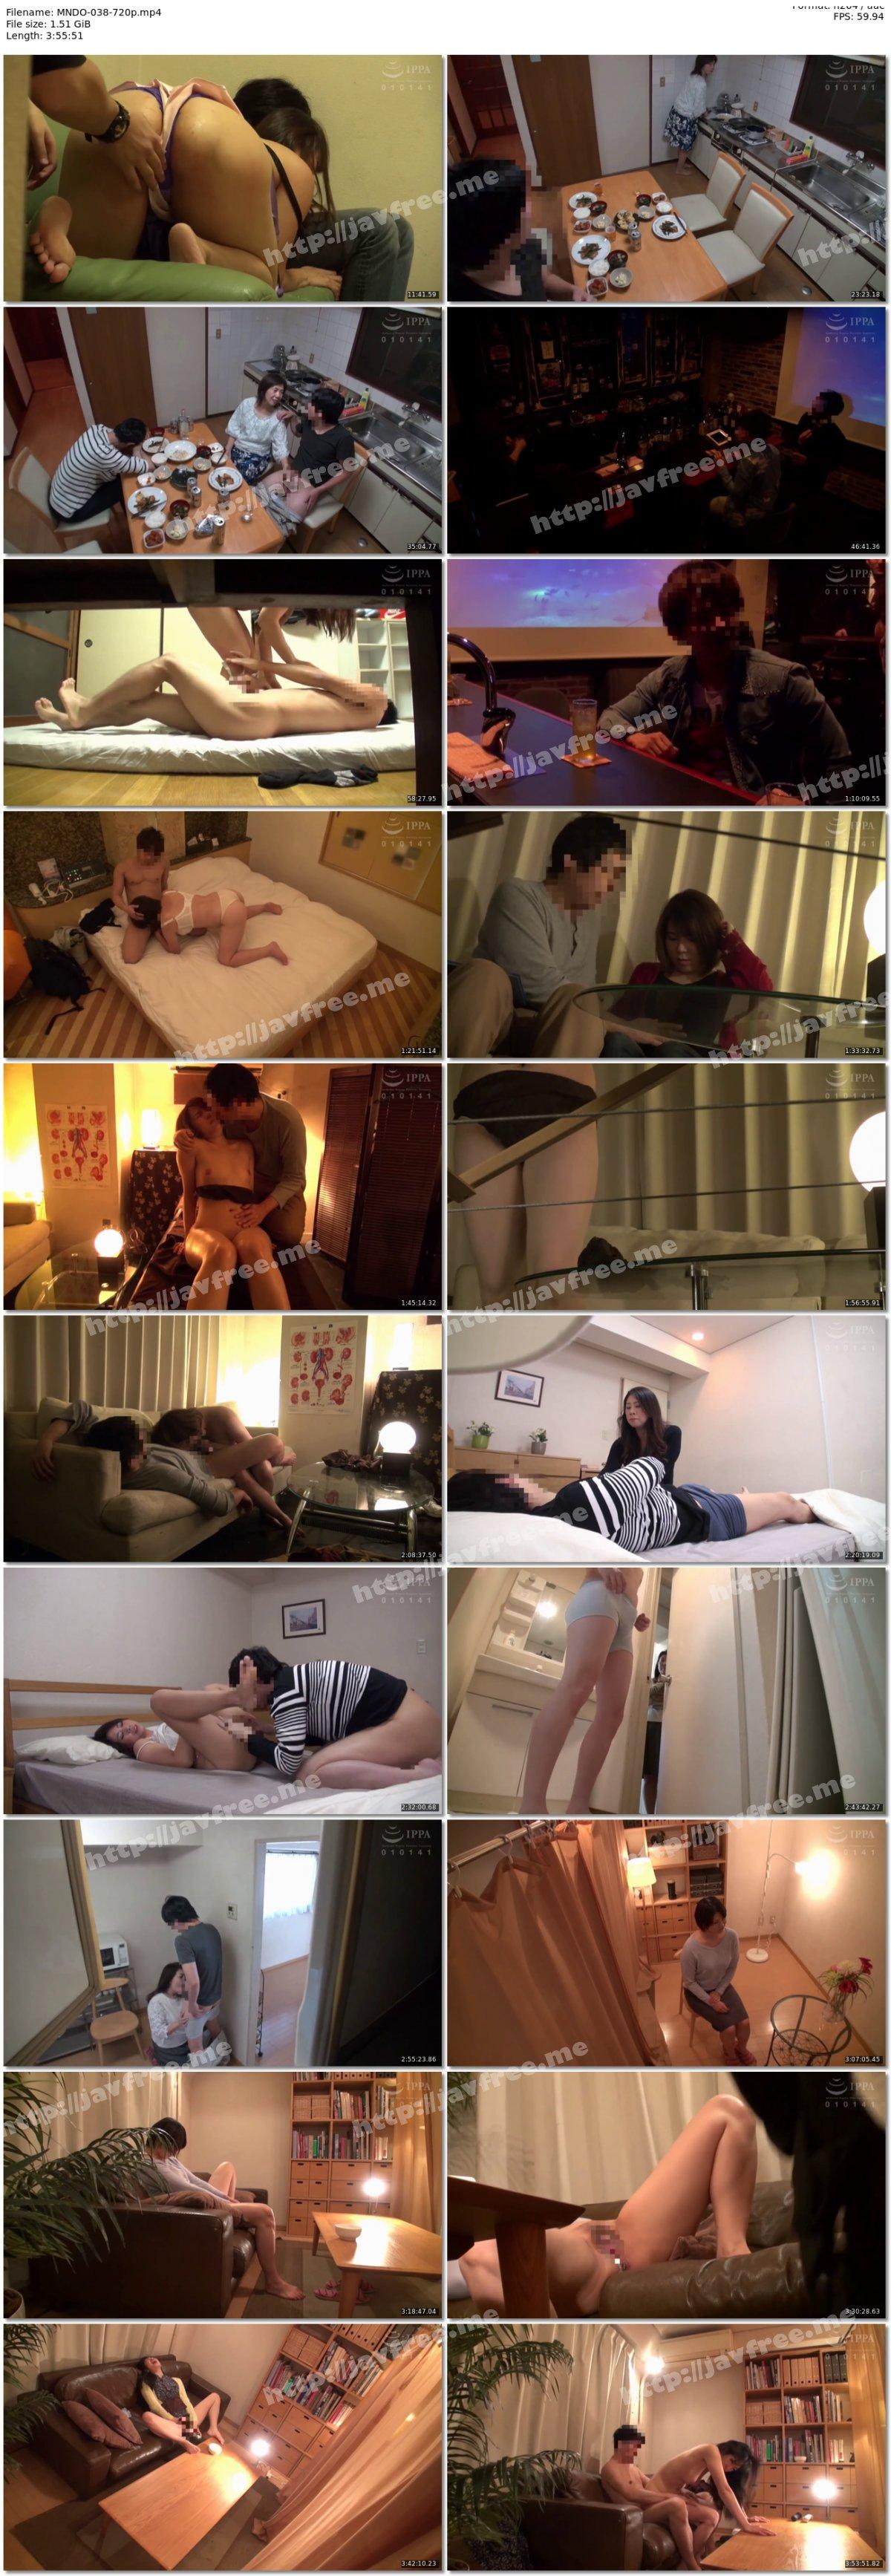 [HD][MNDO-038] セックスレスの素人熟女にどっぷり中出し!ベスト2 - image MNDO-038-720p on https://javfree.me